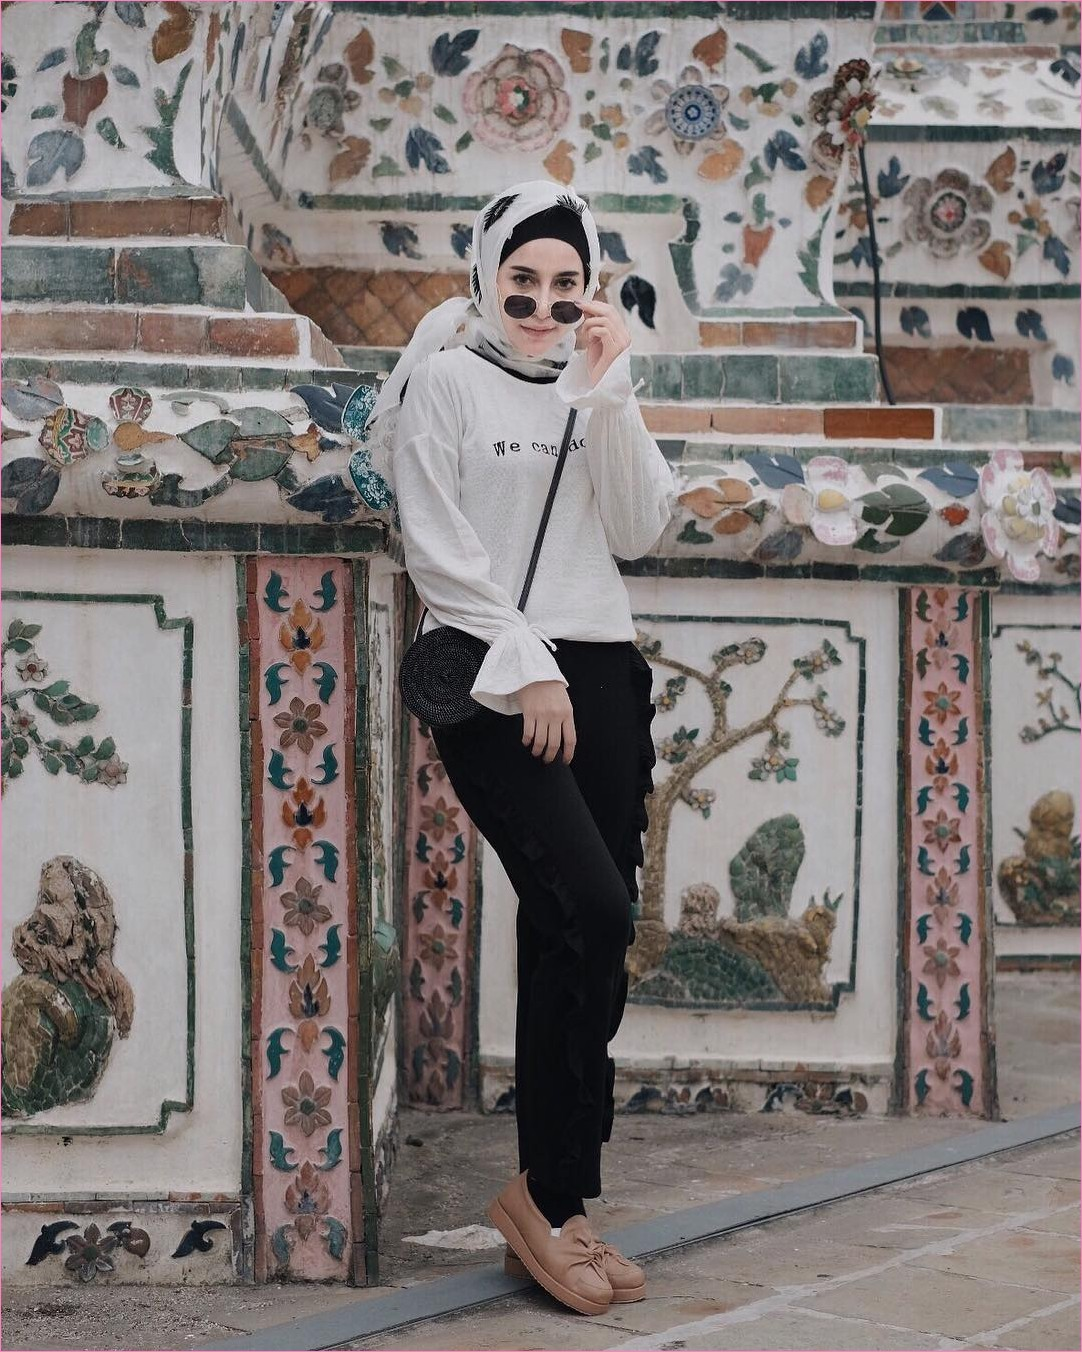 Outfit Baju Hijab Casual Untuk Kuliah Ala Selebgram 2018 top blouse lengan terompet lebar hijab square bermotif bunga putih ciput rajut kacamata longpants sling bags kaos kaki flatshoes lace ups coklat tua gaya casual kain sutra katun rayon ootd 2018 outfit selebgram keramik pohon